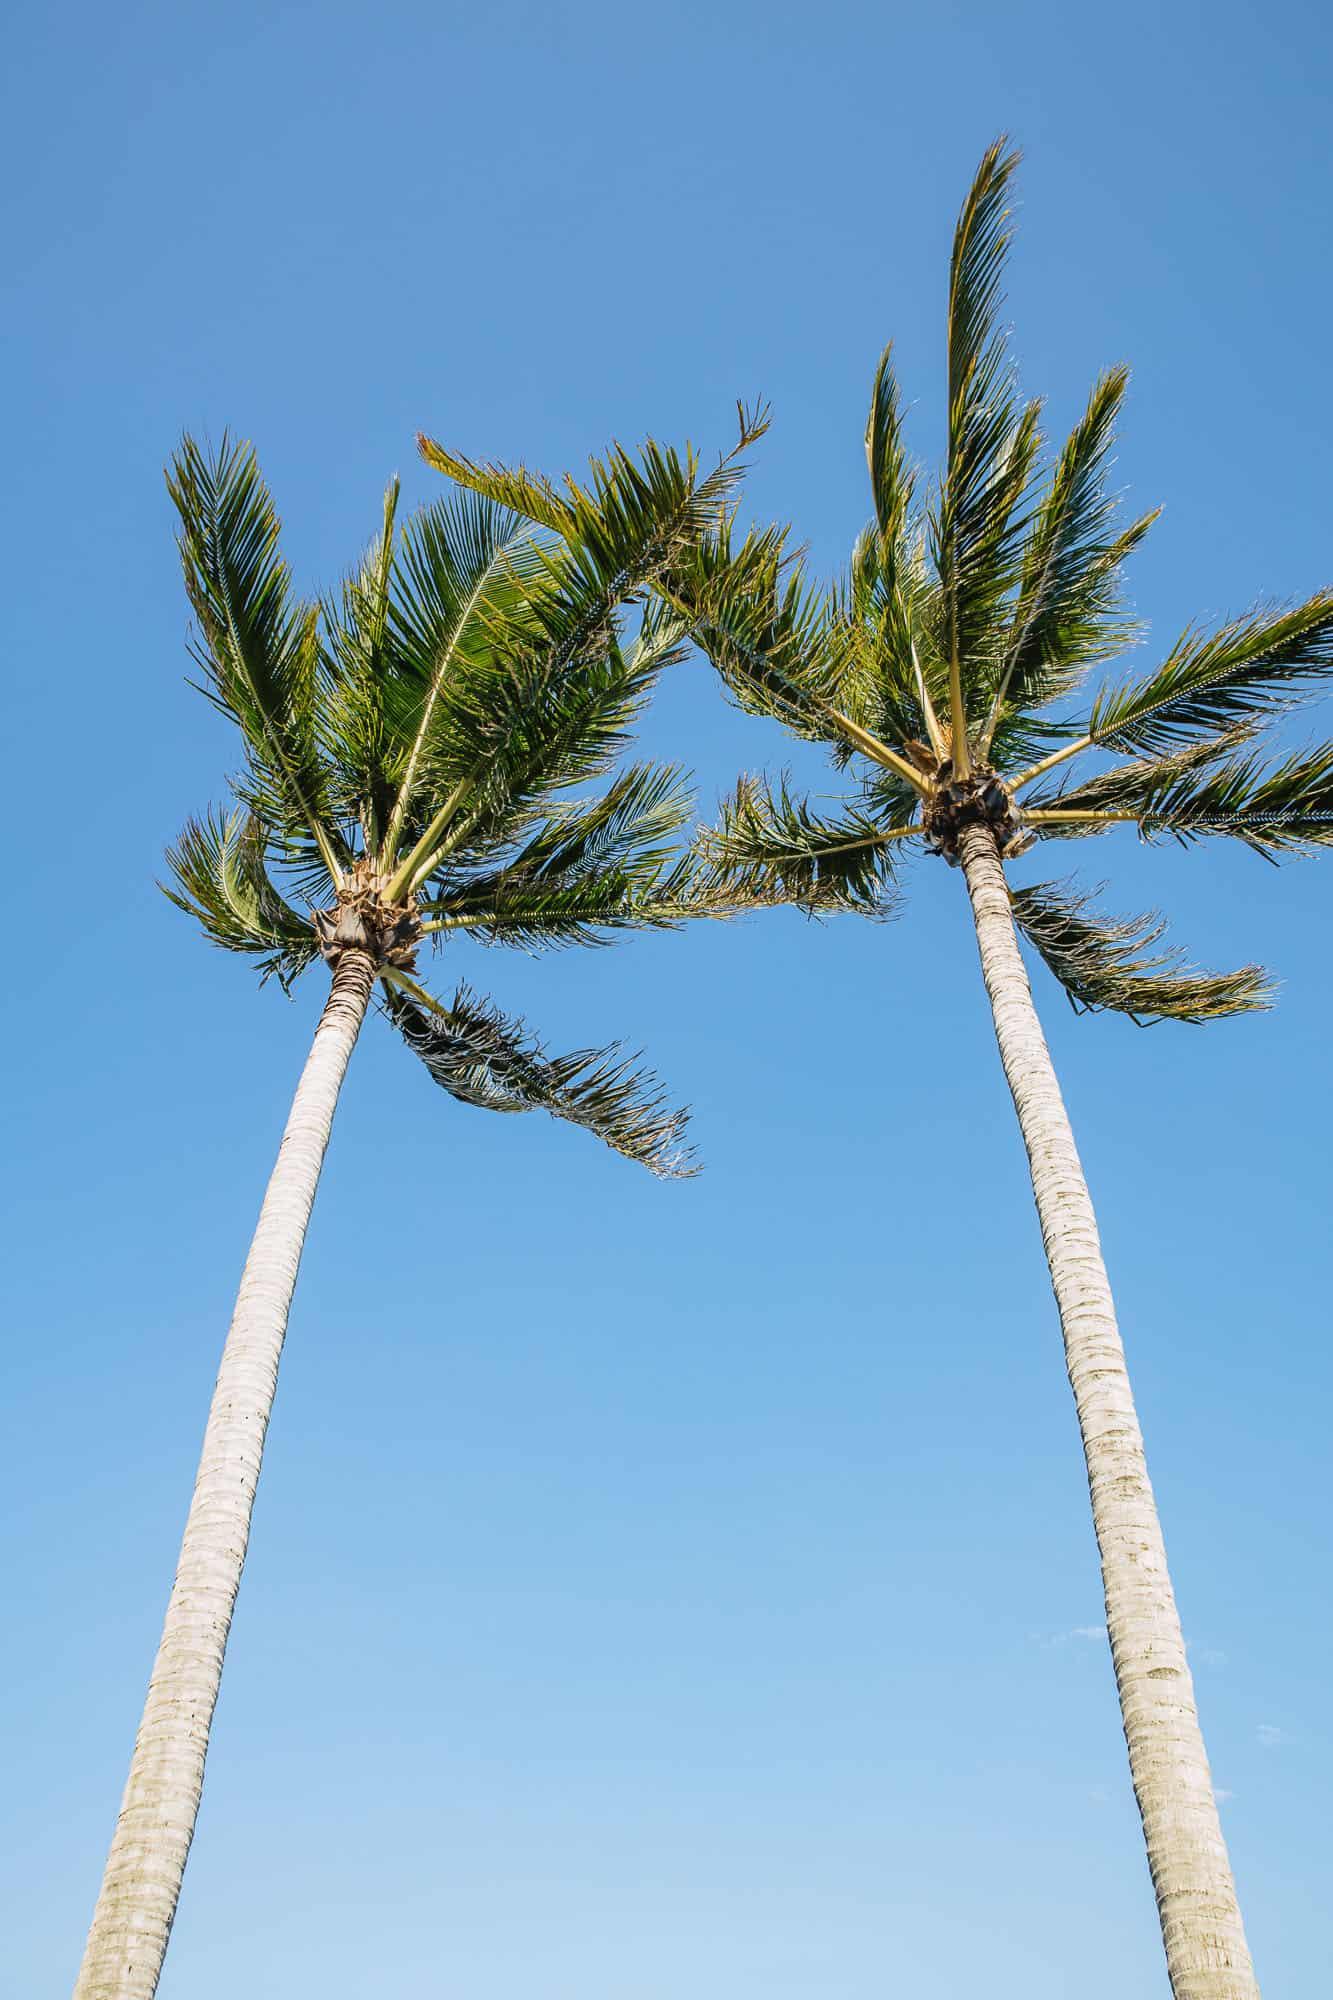 yeppoon beaches, beaches yeppoon, best beaches in yeppoon, beaches in yeppoon, zilzie beach